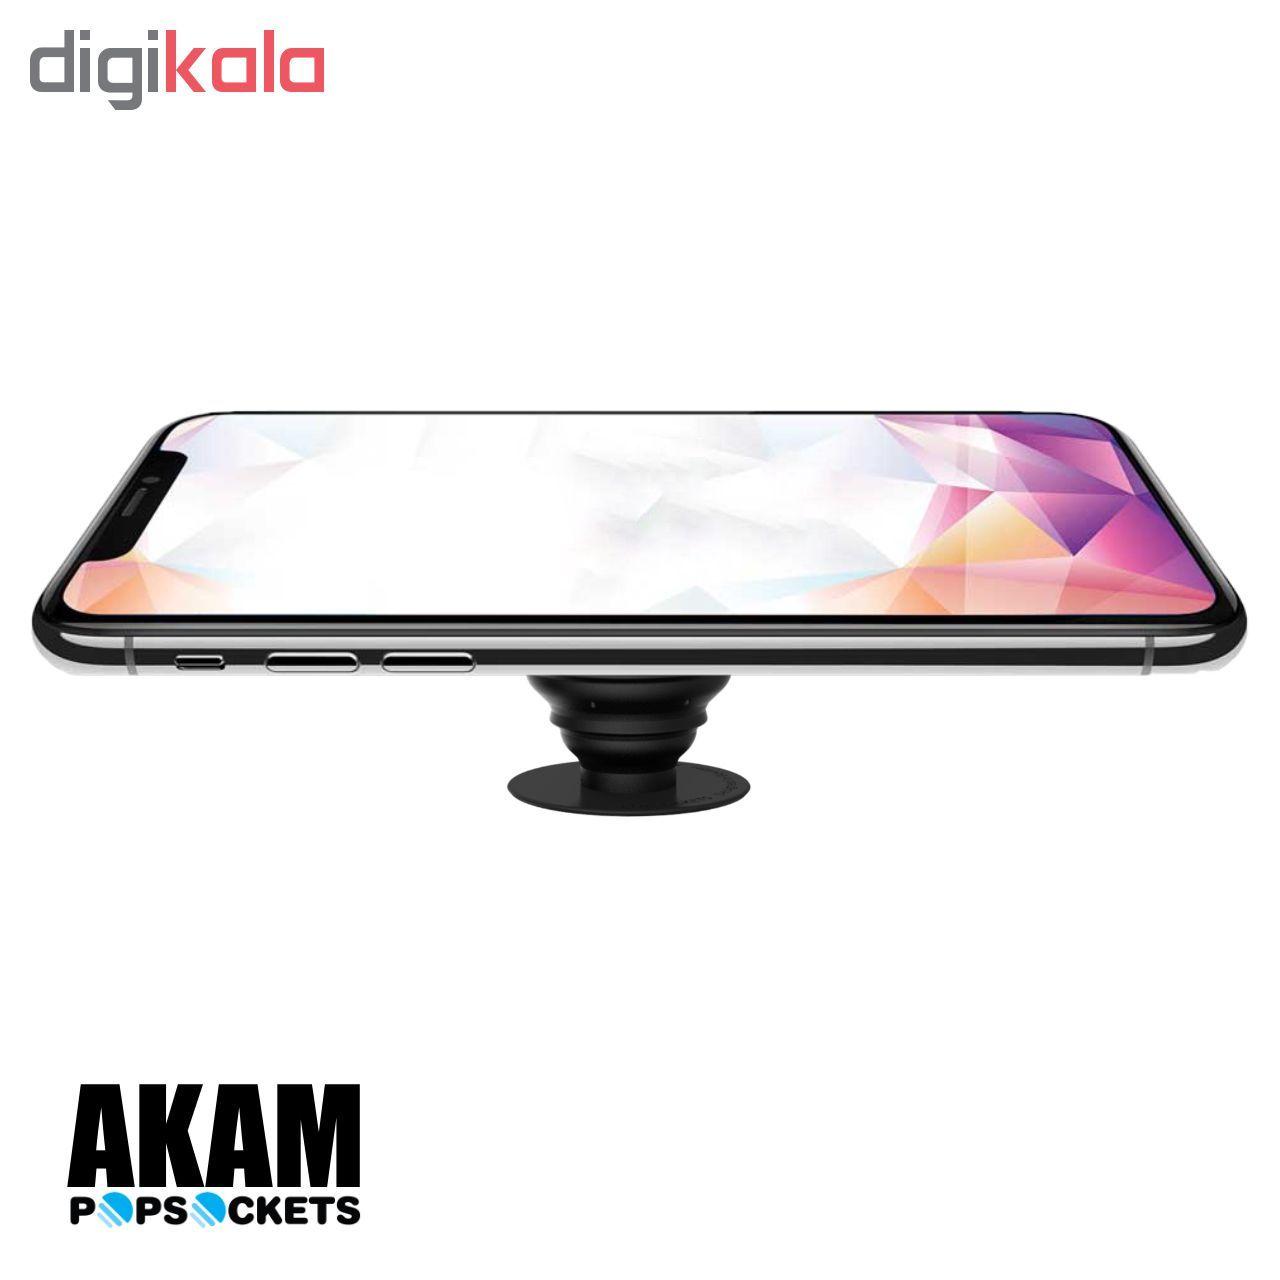 پایه نگهدارنده گوشی موبایل پاپ سوکت آکام مدل APS0195 main 1 9